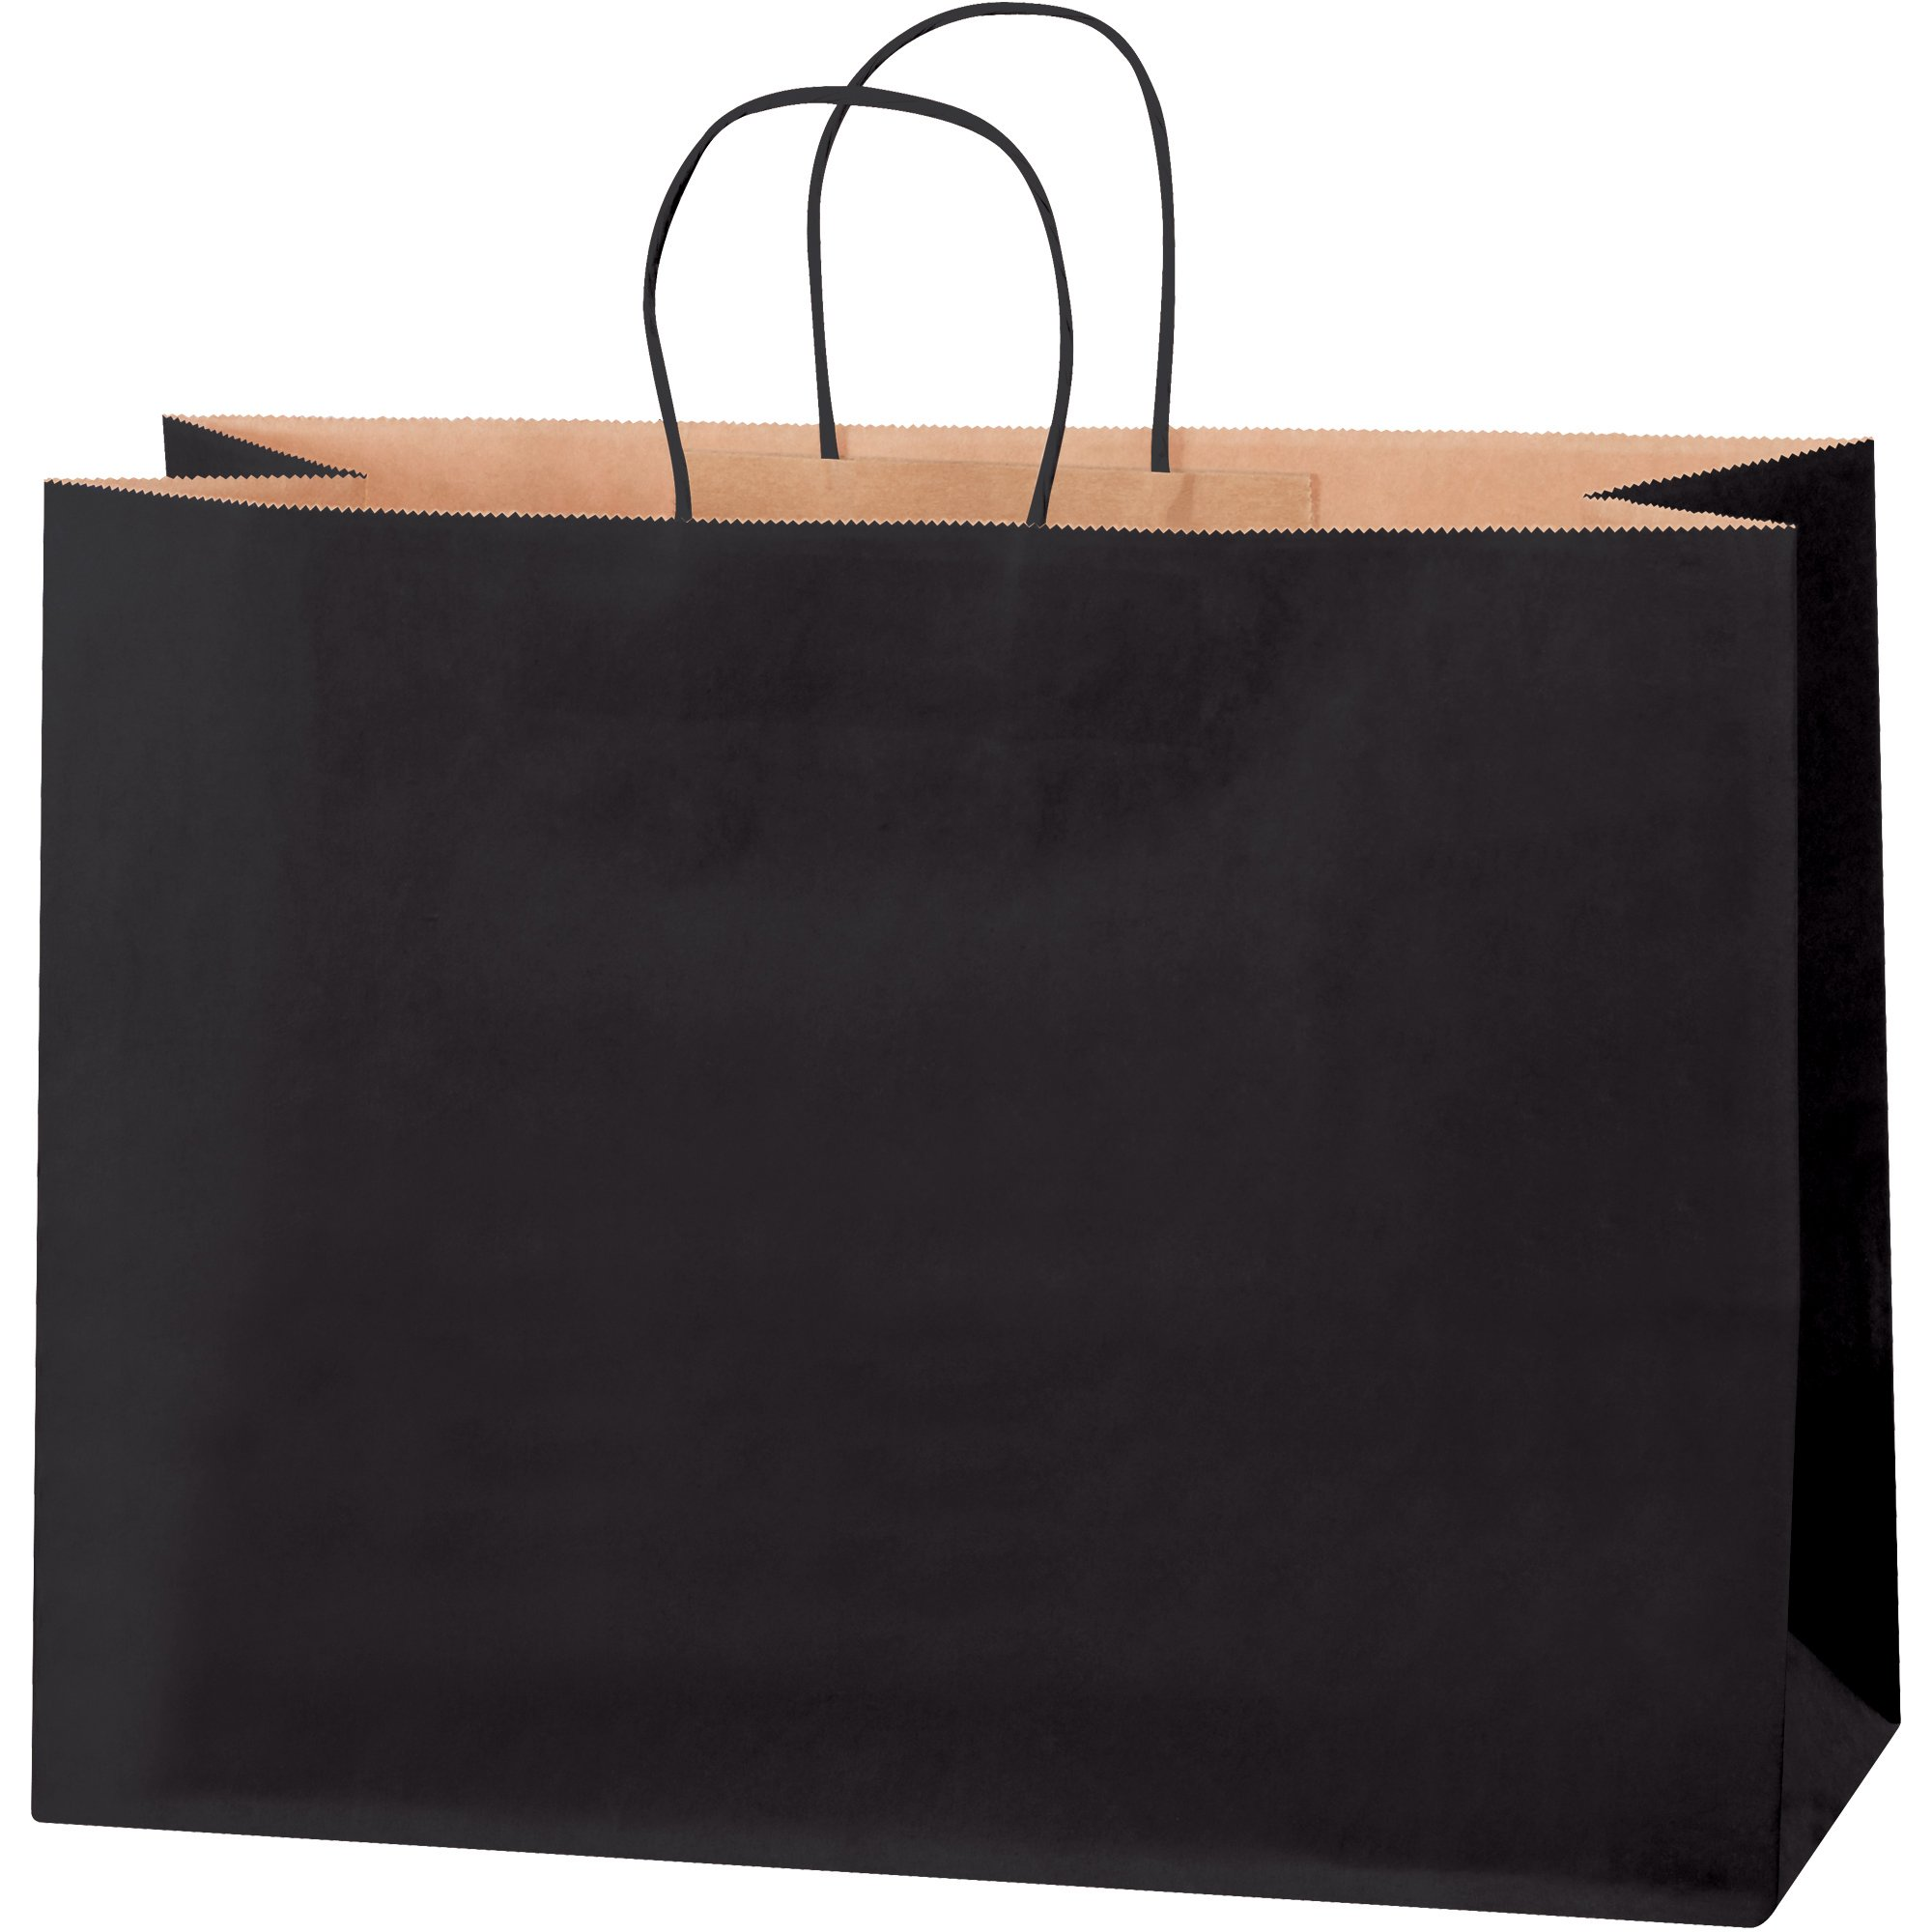 Tinted Shopping Bags, 16'' x 6'' x 12'', Black, 250/Case